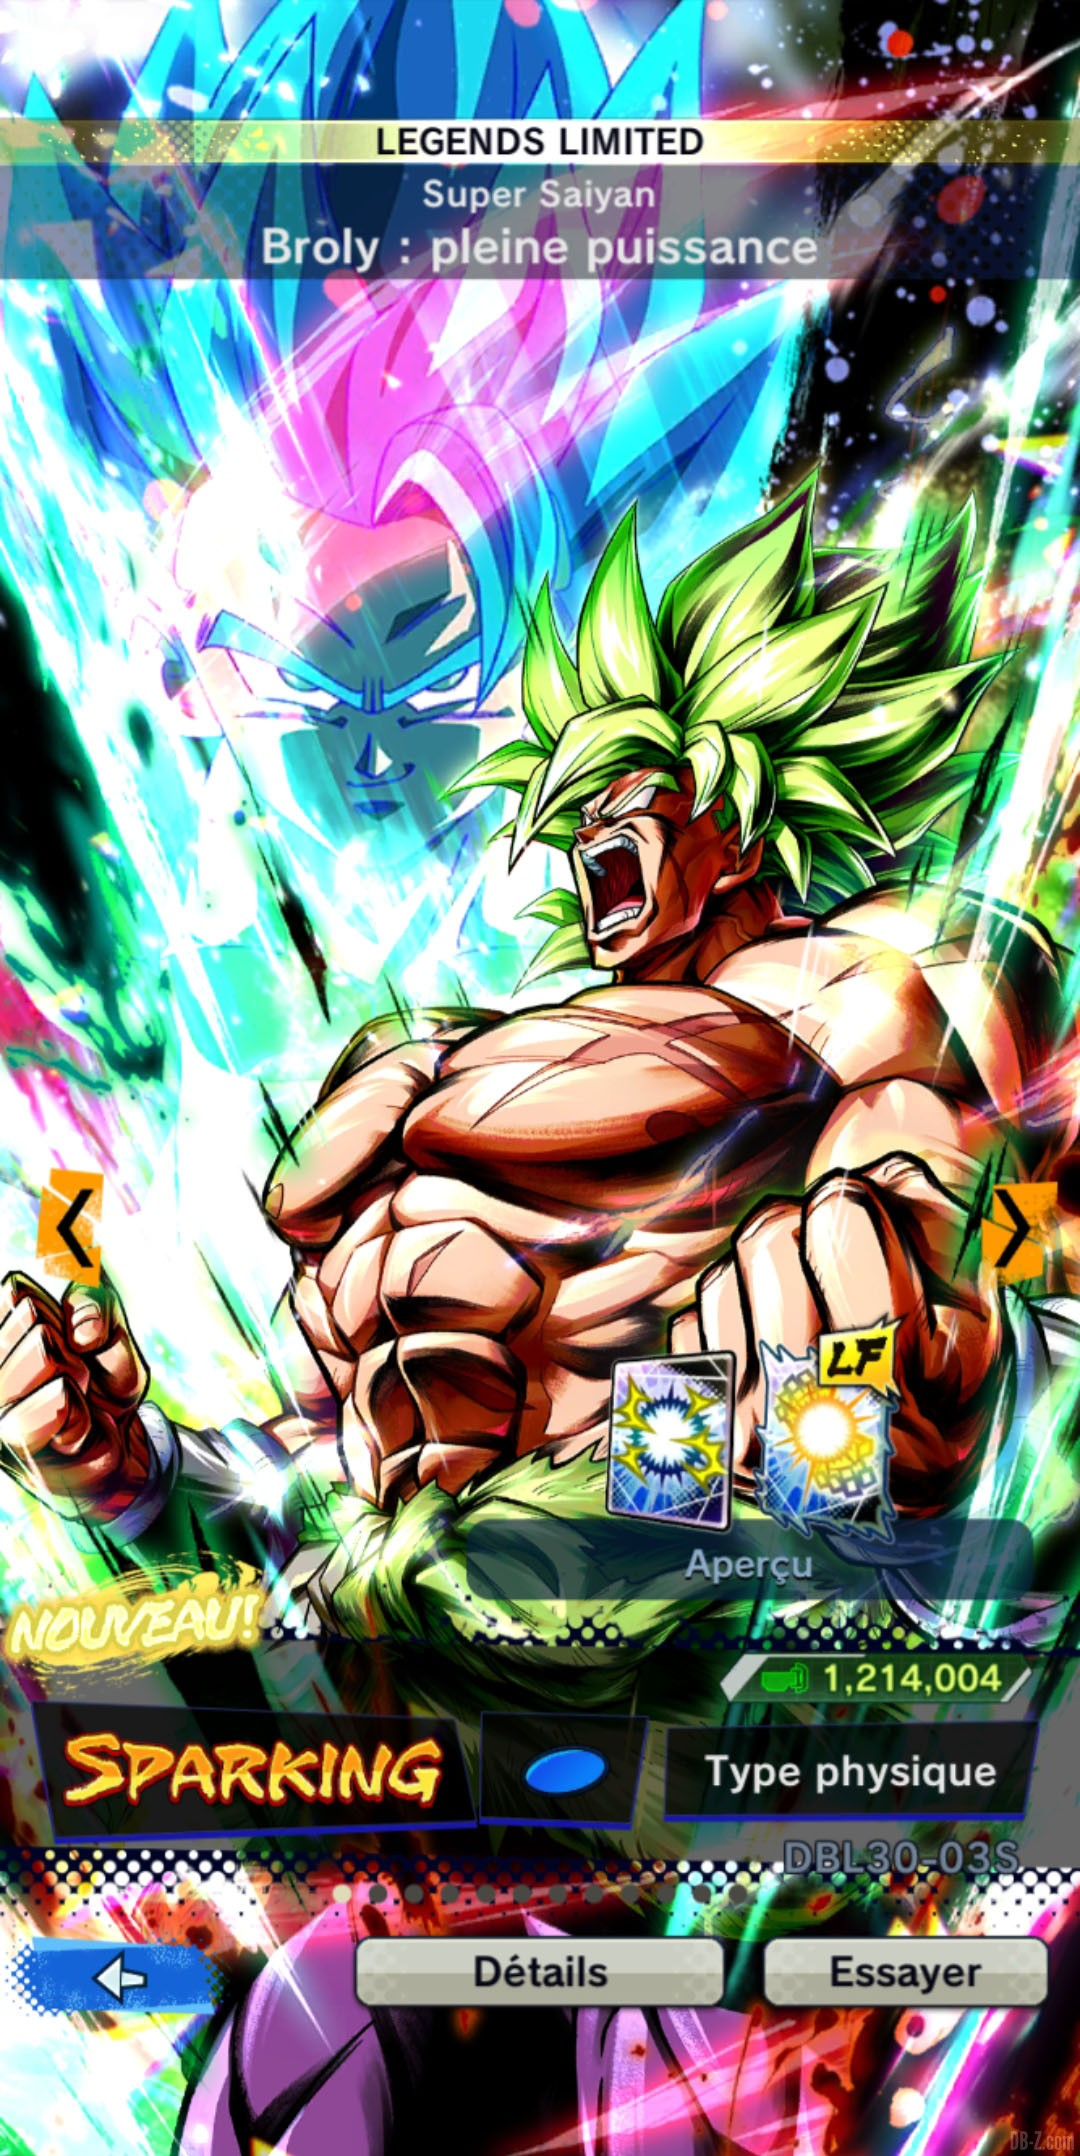 Dragon Ball Legends Limited Broly Super Saiyan Full Power BLEU Physique